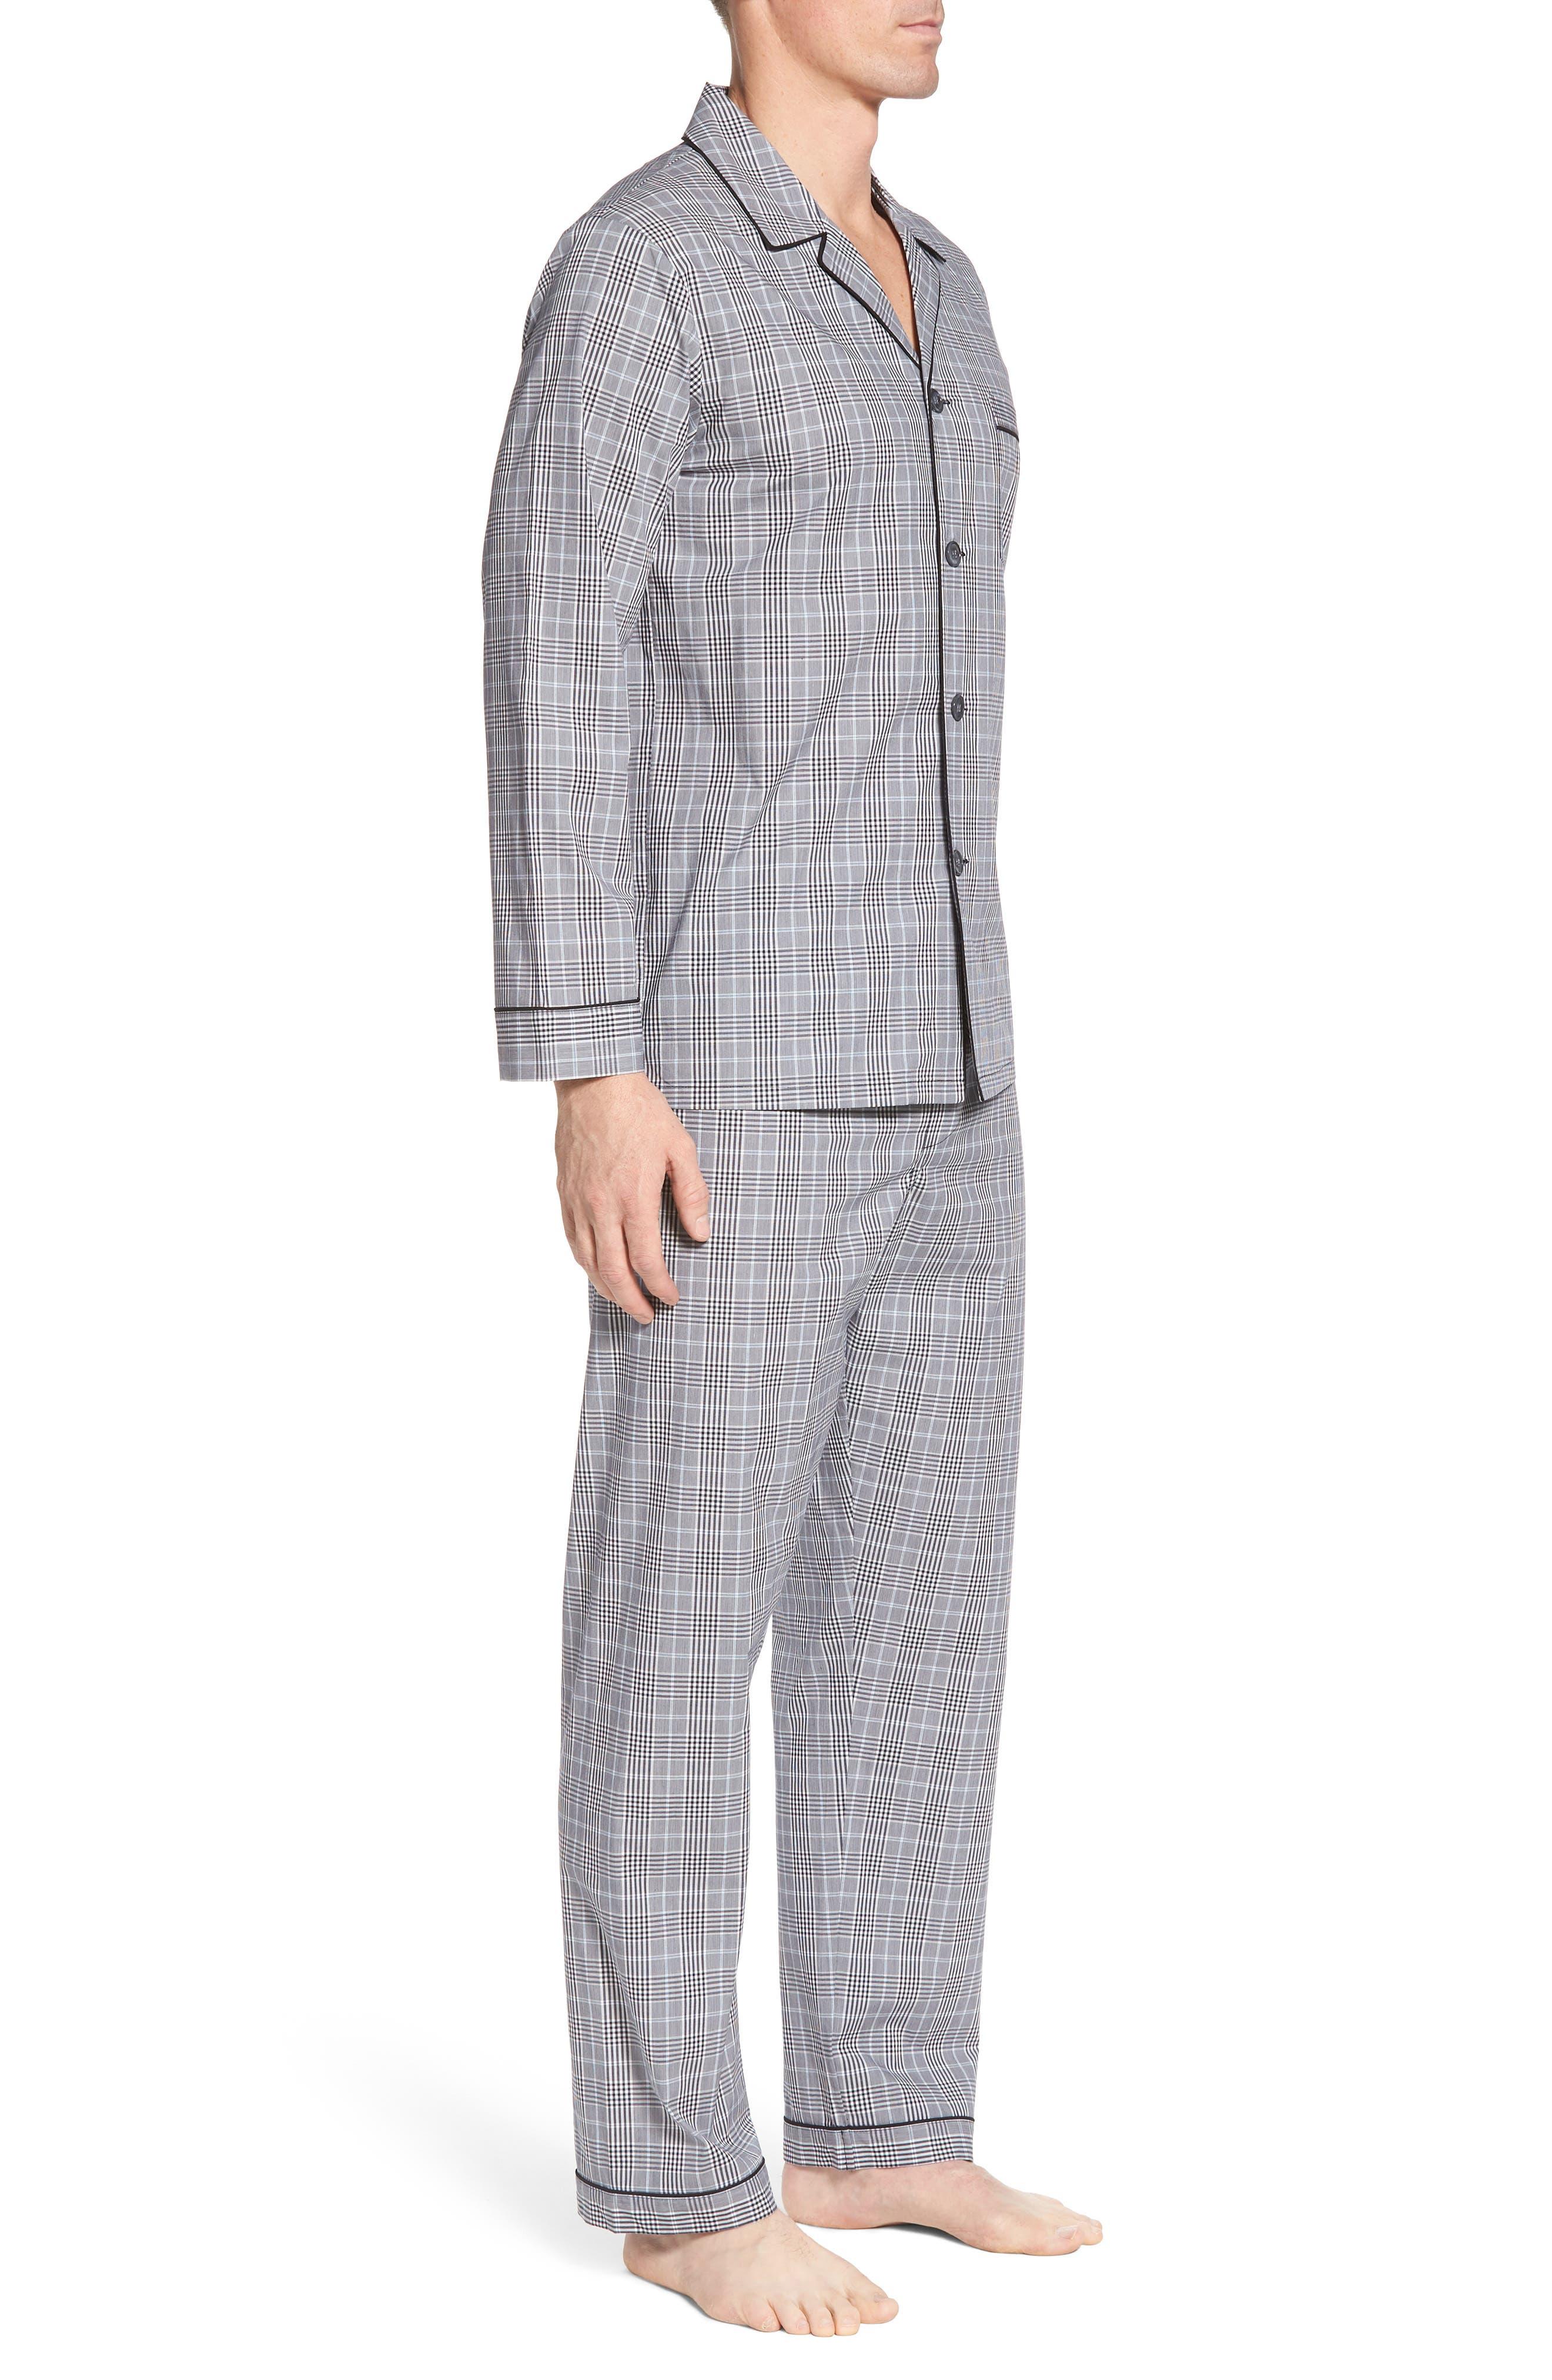 Charleston Pajama Set,                             Alternate thumbnail 3, color,                             Black Plaid